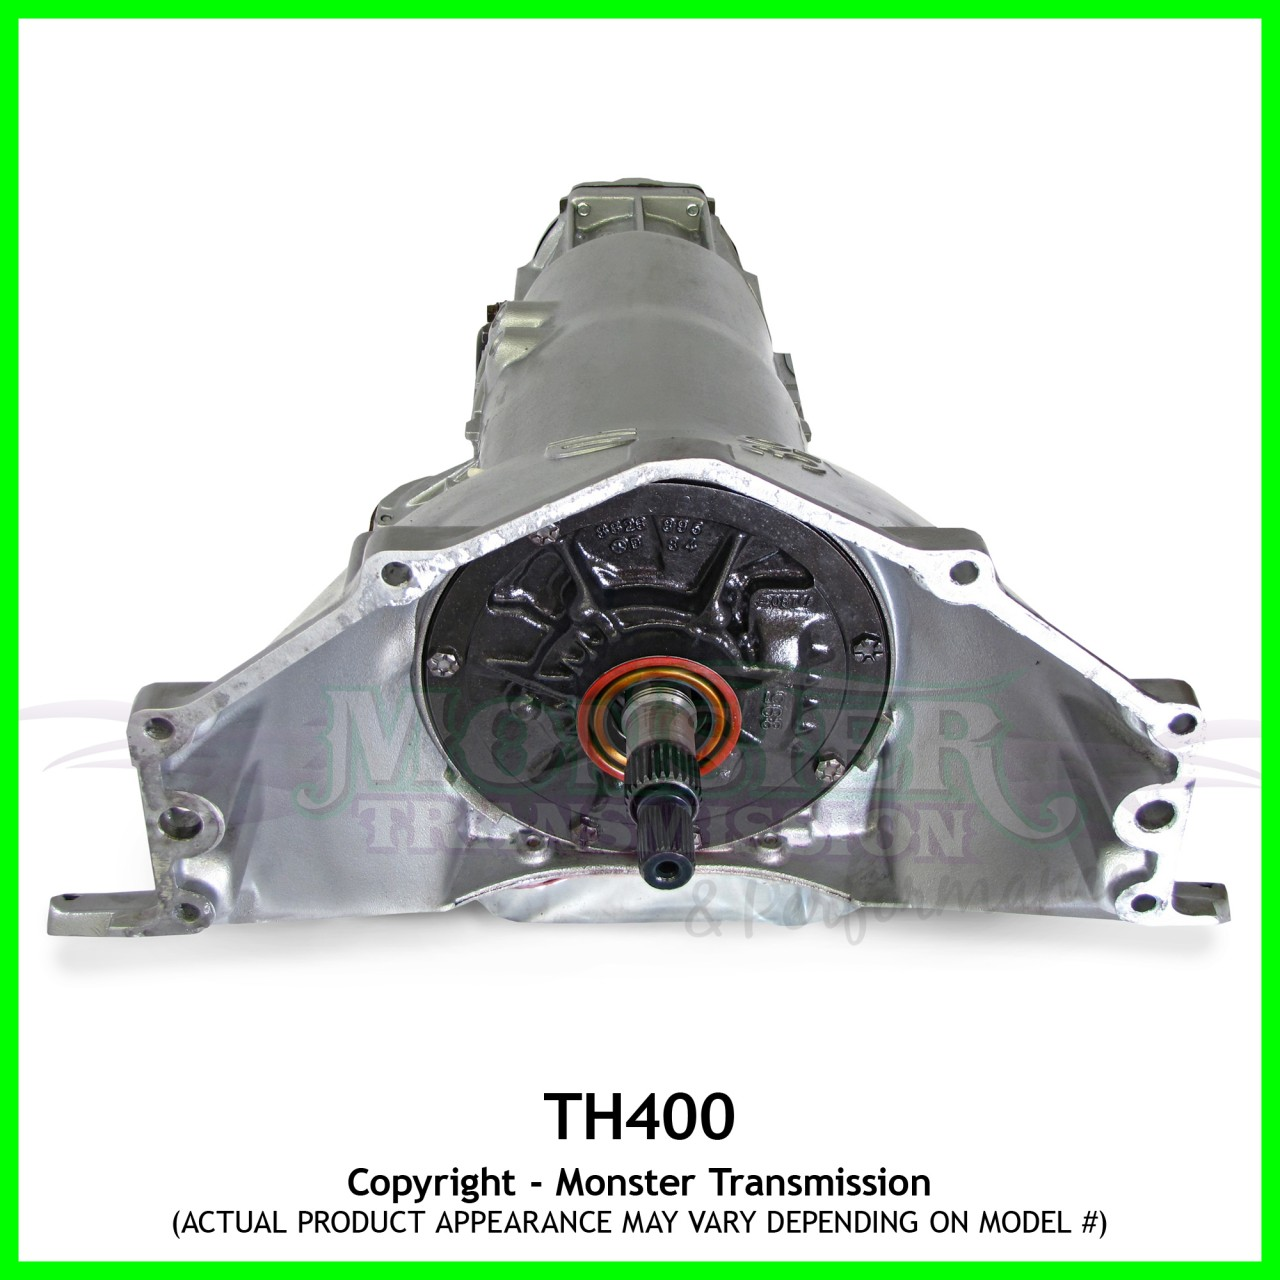 th400 transmission diagram 2013 ford f150 wiring chevy 350 turbo autos post